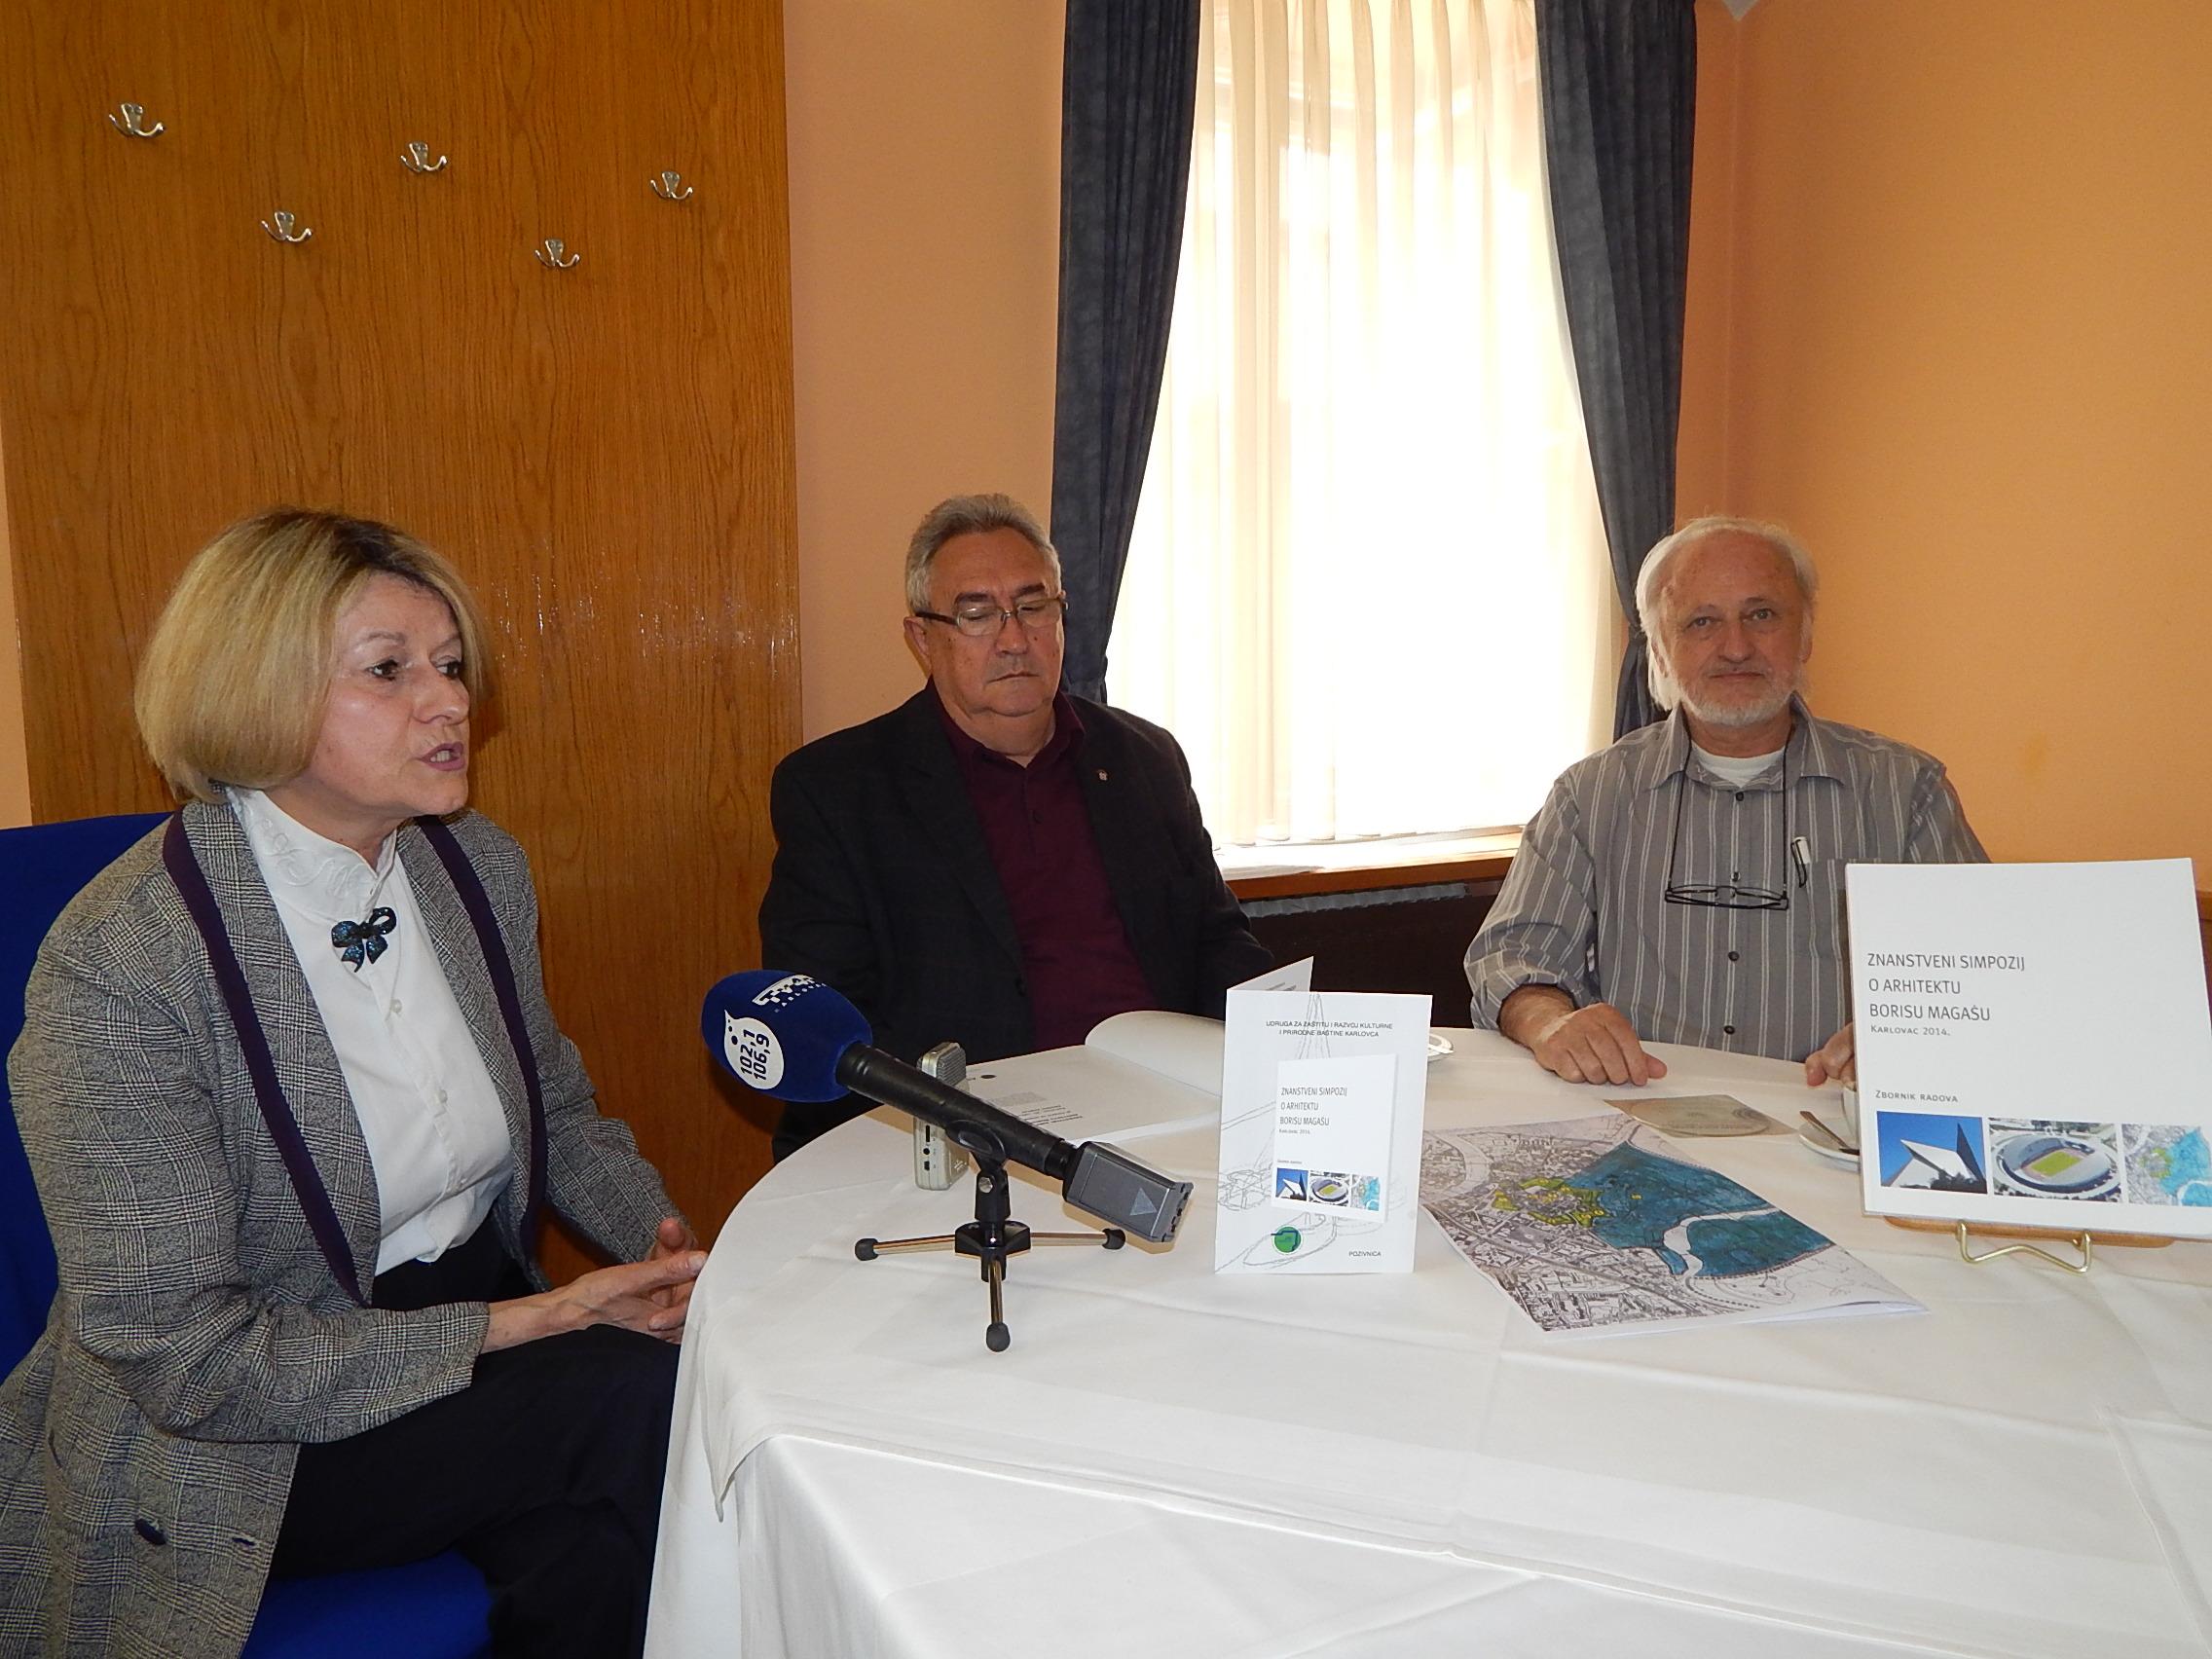 Marina Majoli, Zvonimir Gerber i Boris Morsan. Foto: Marin Bakić